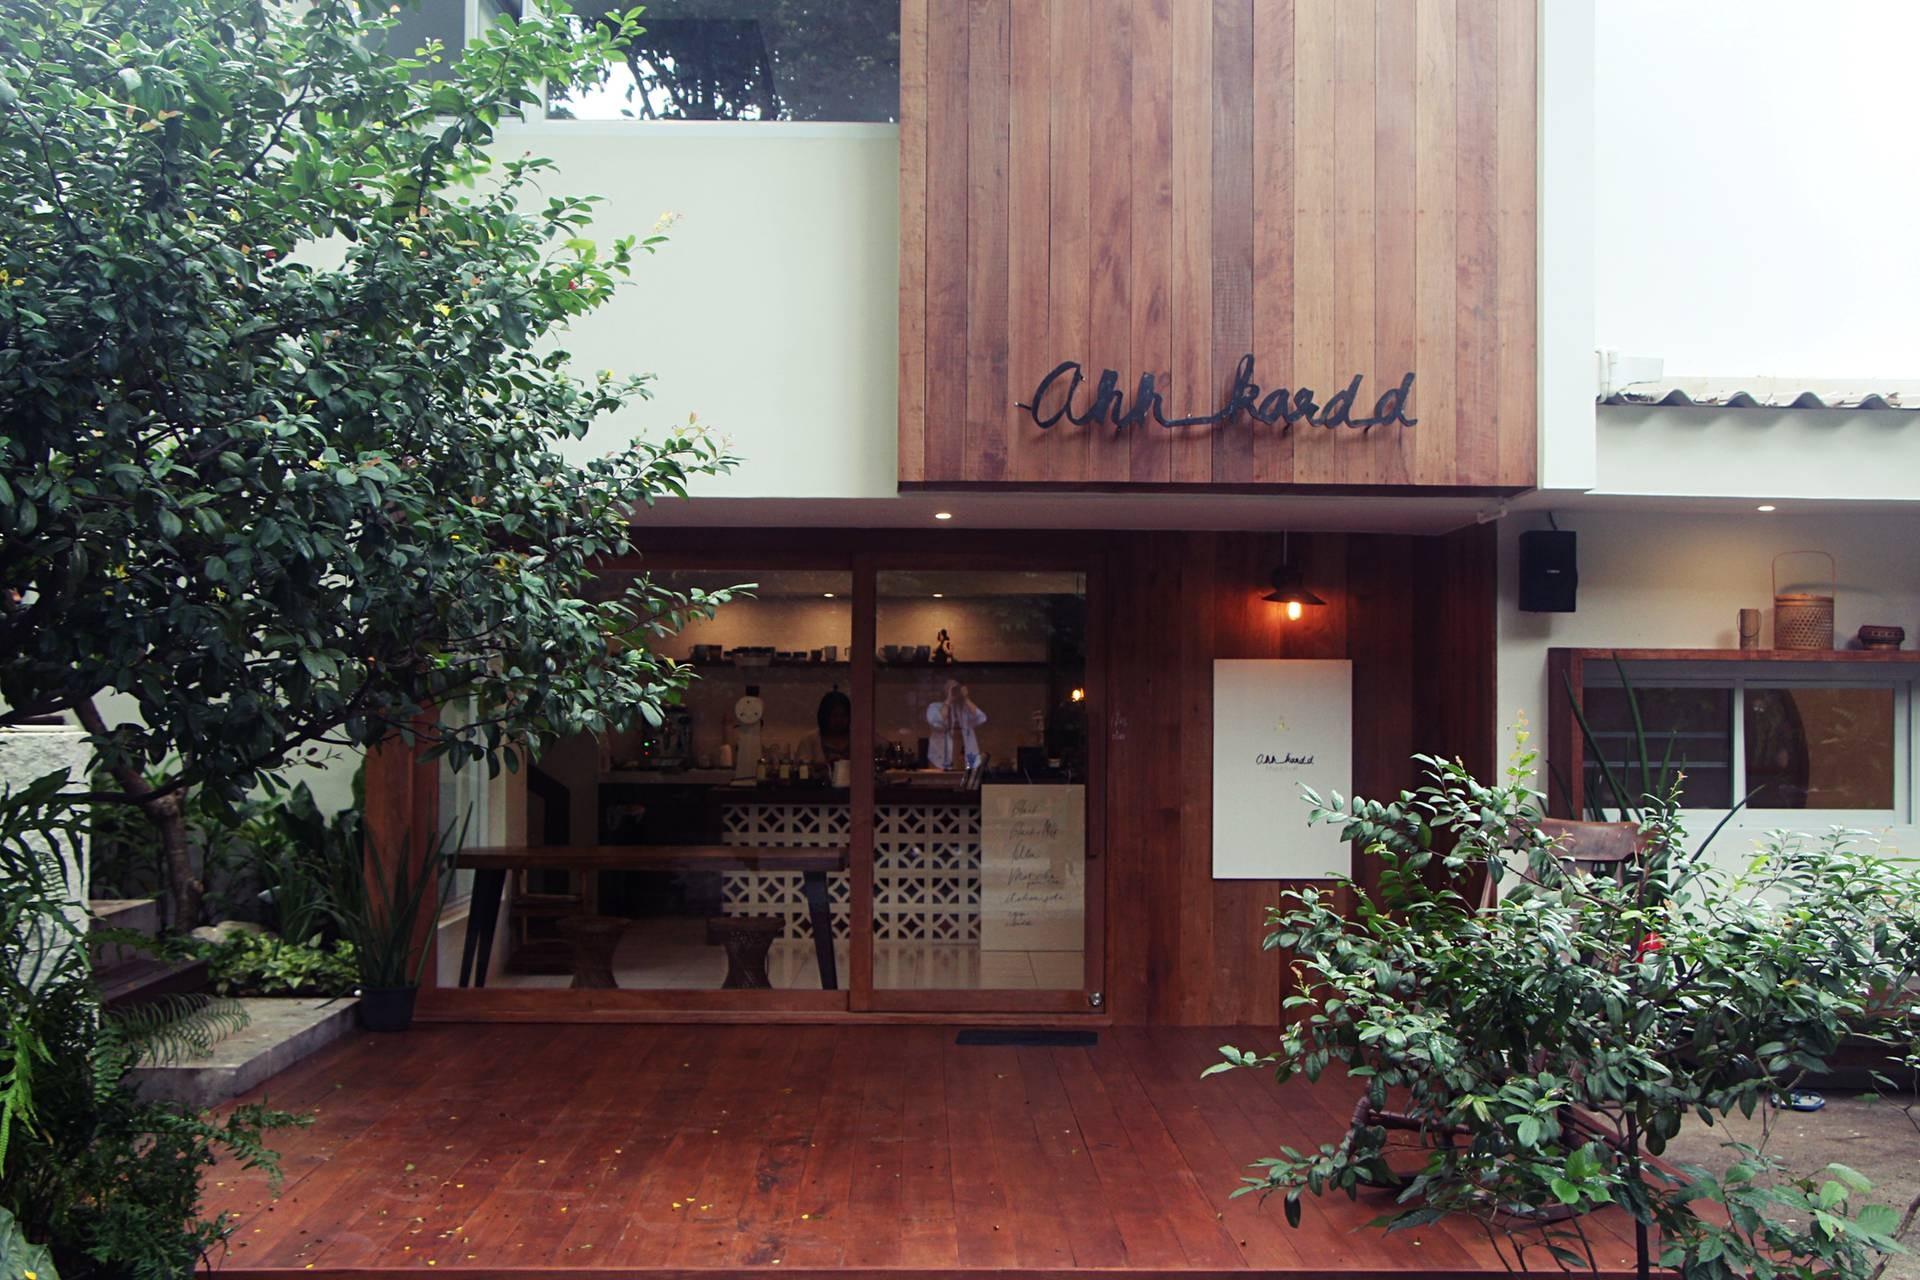 Ahh Kard D Restaurant